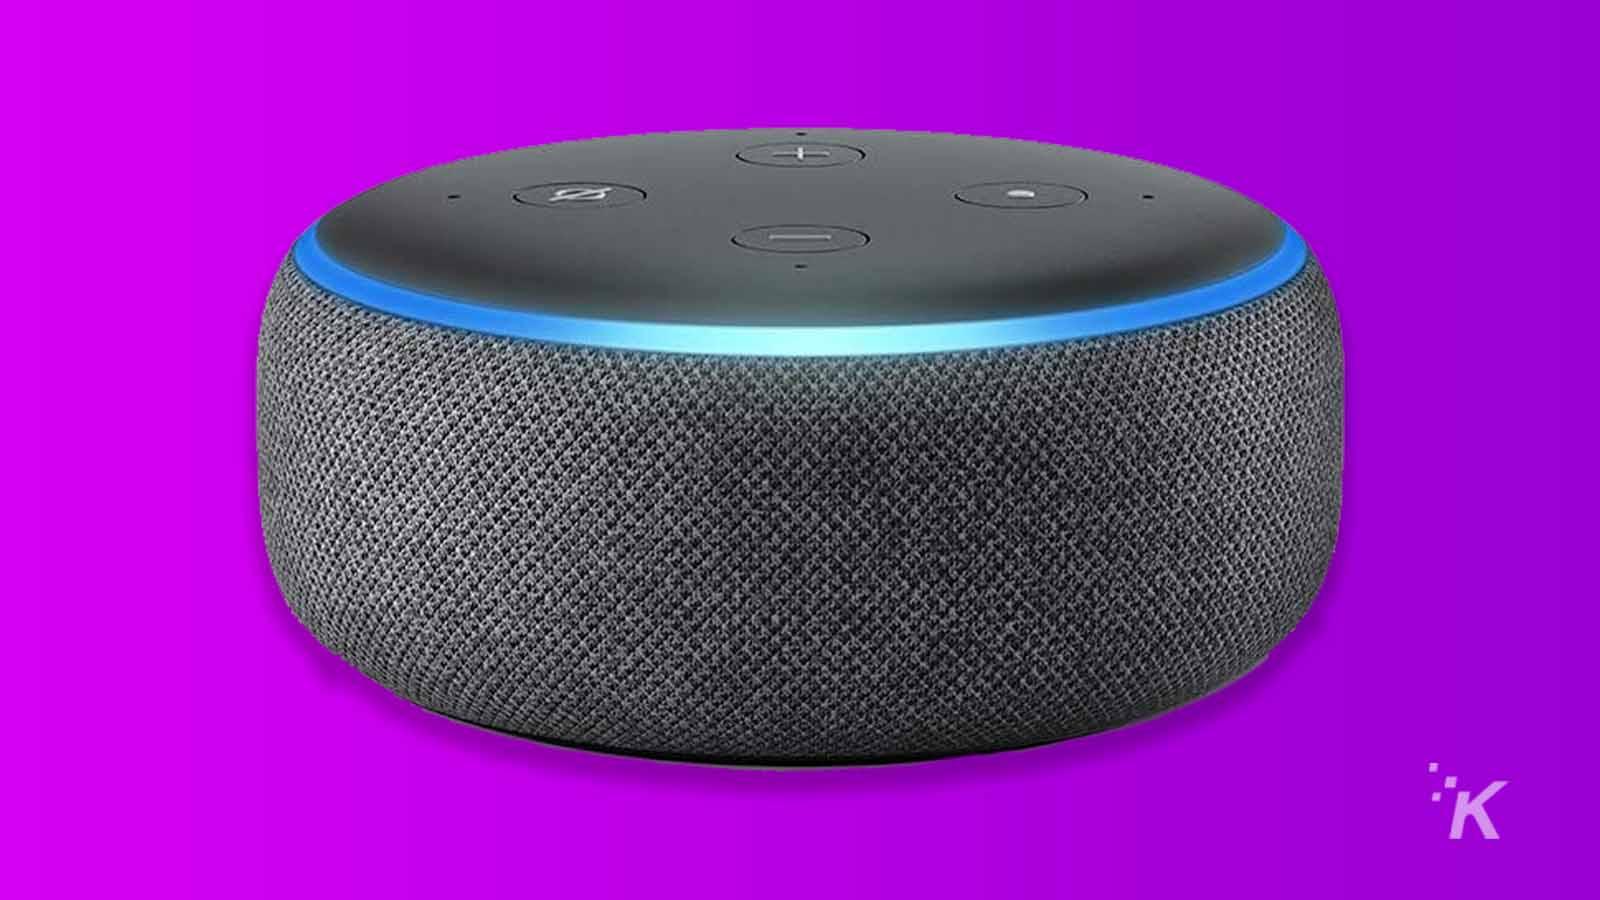 amazon echo dot on purple background